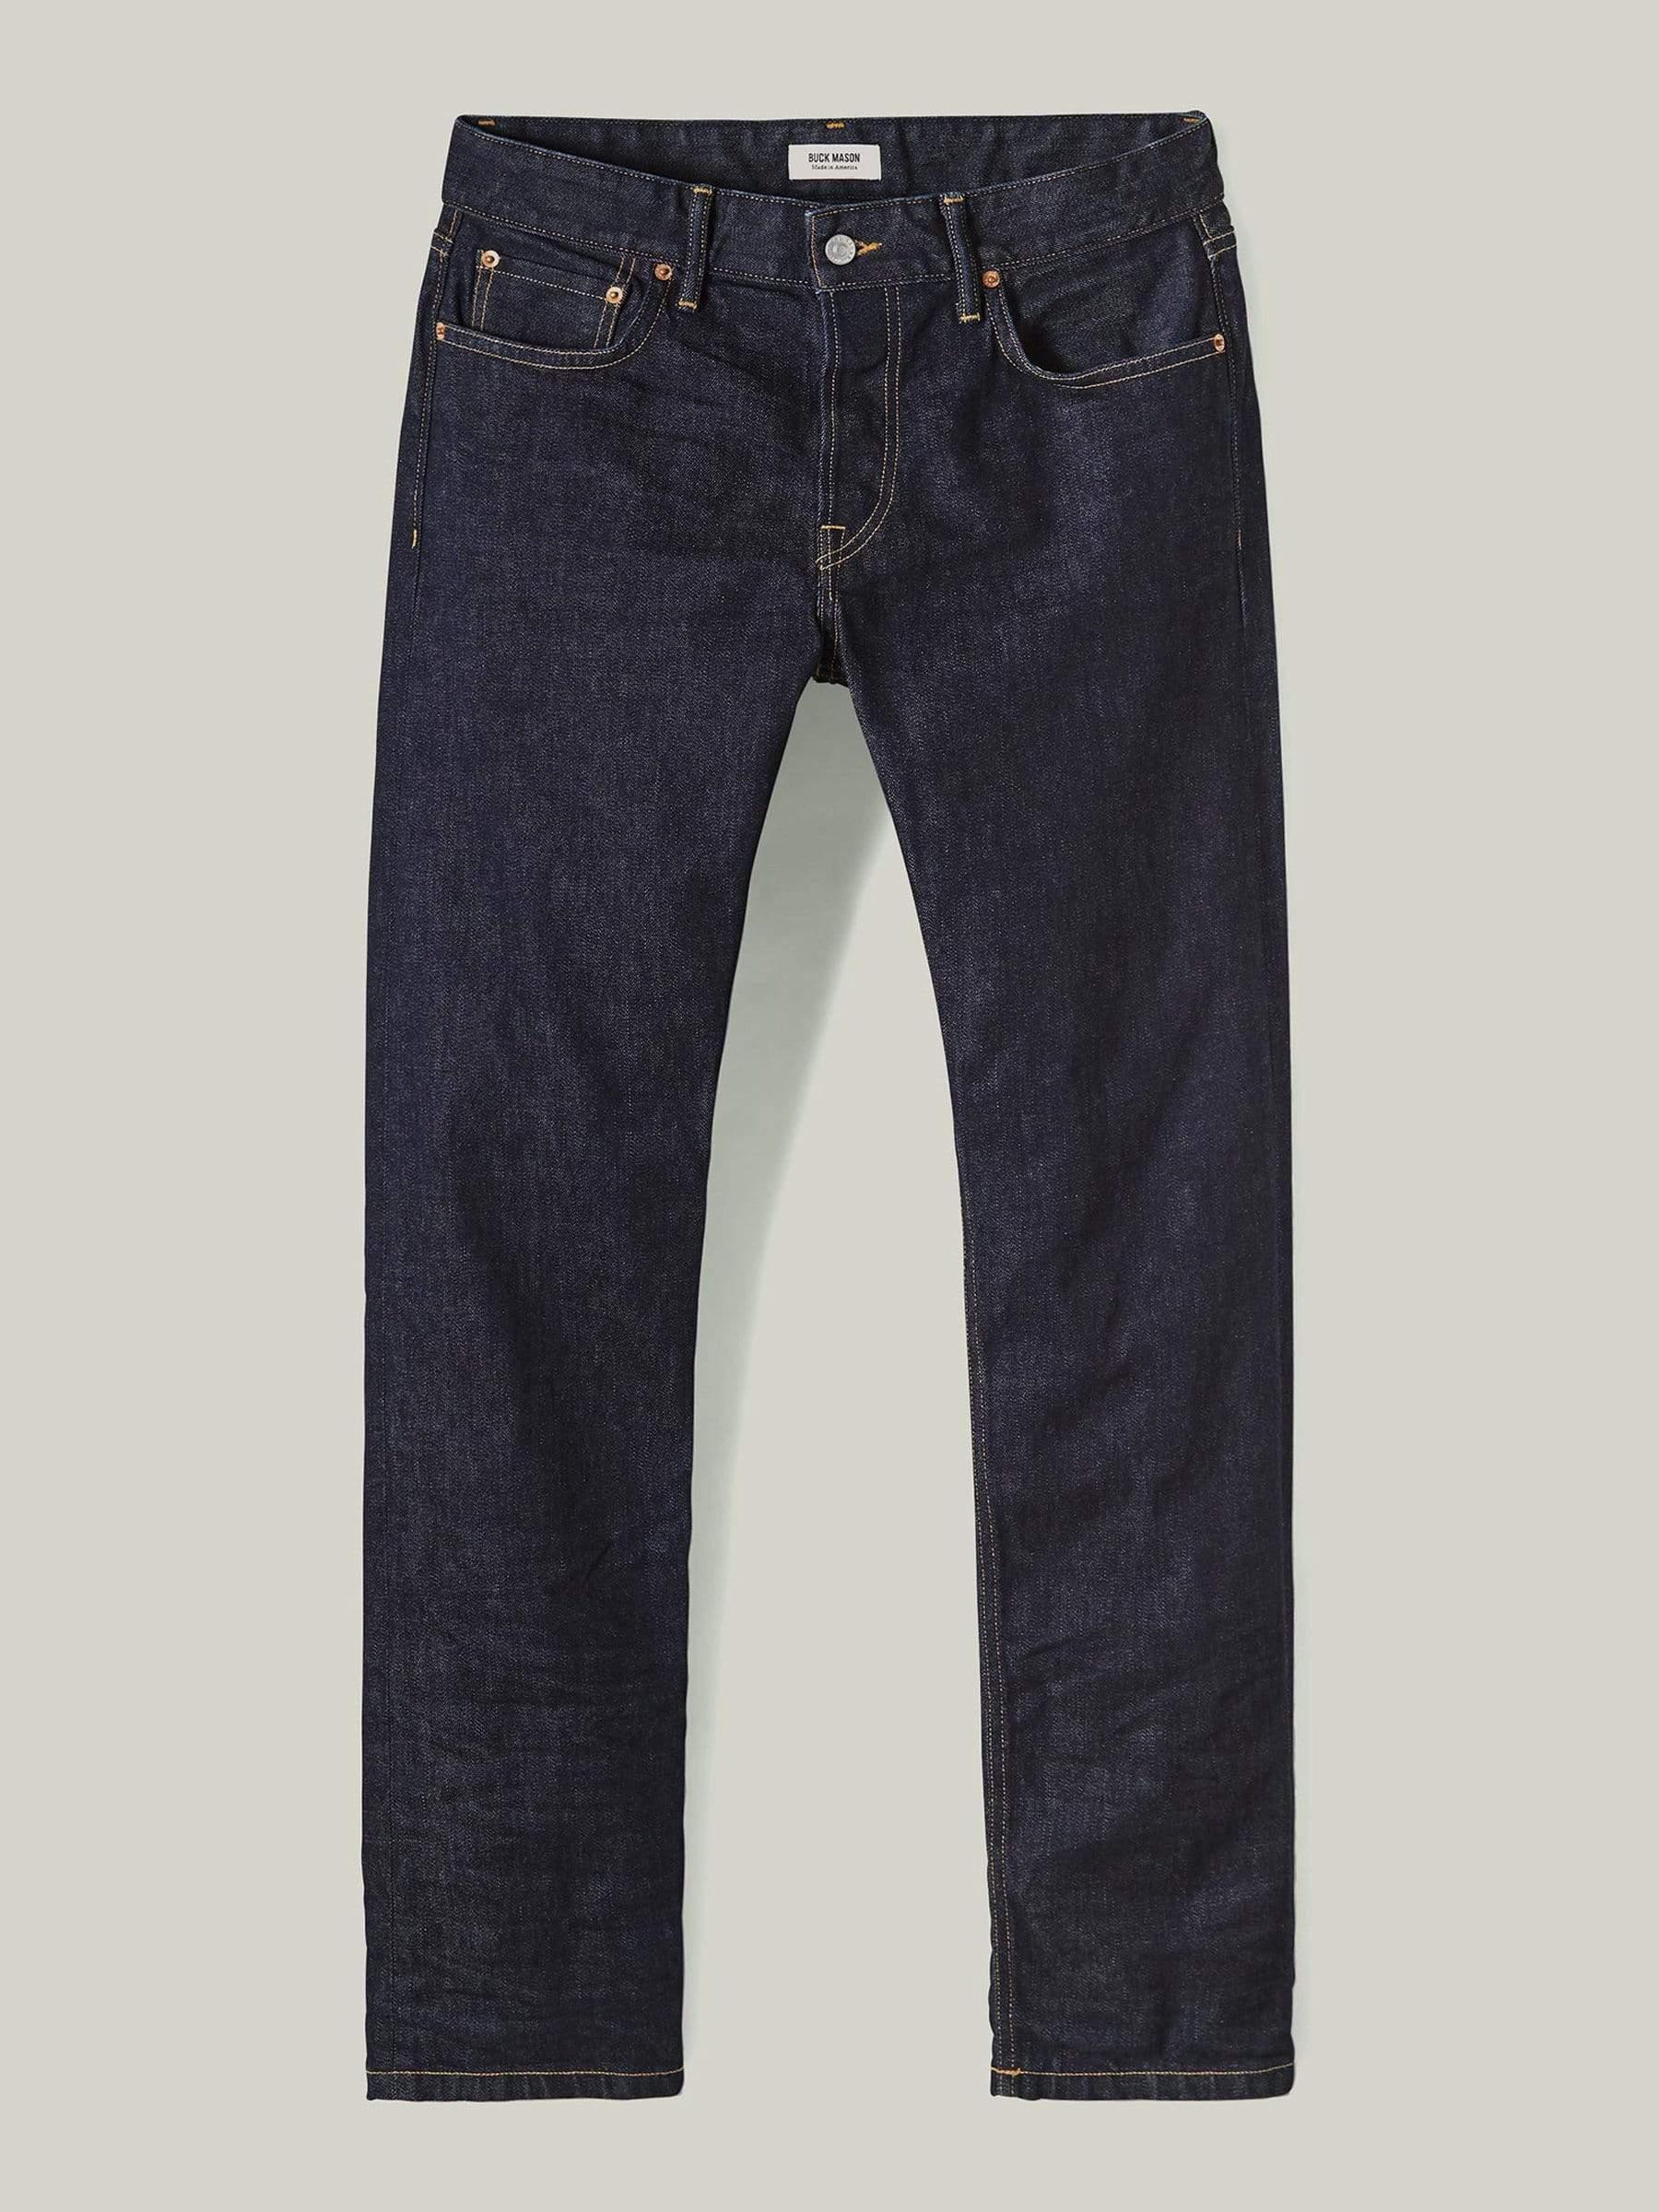 Buck Mason Ford Standard Jean